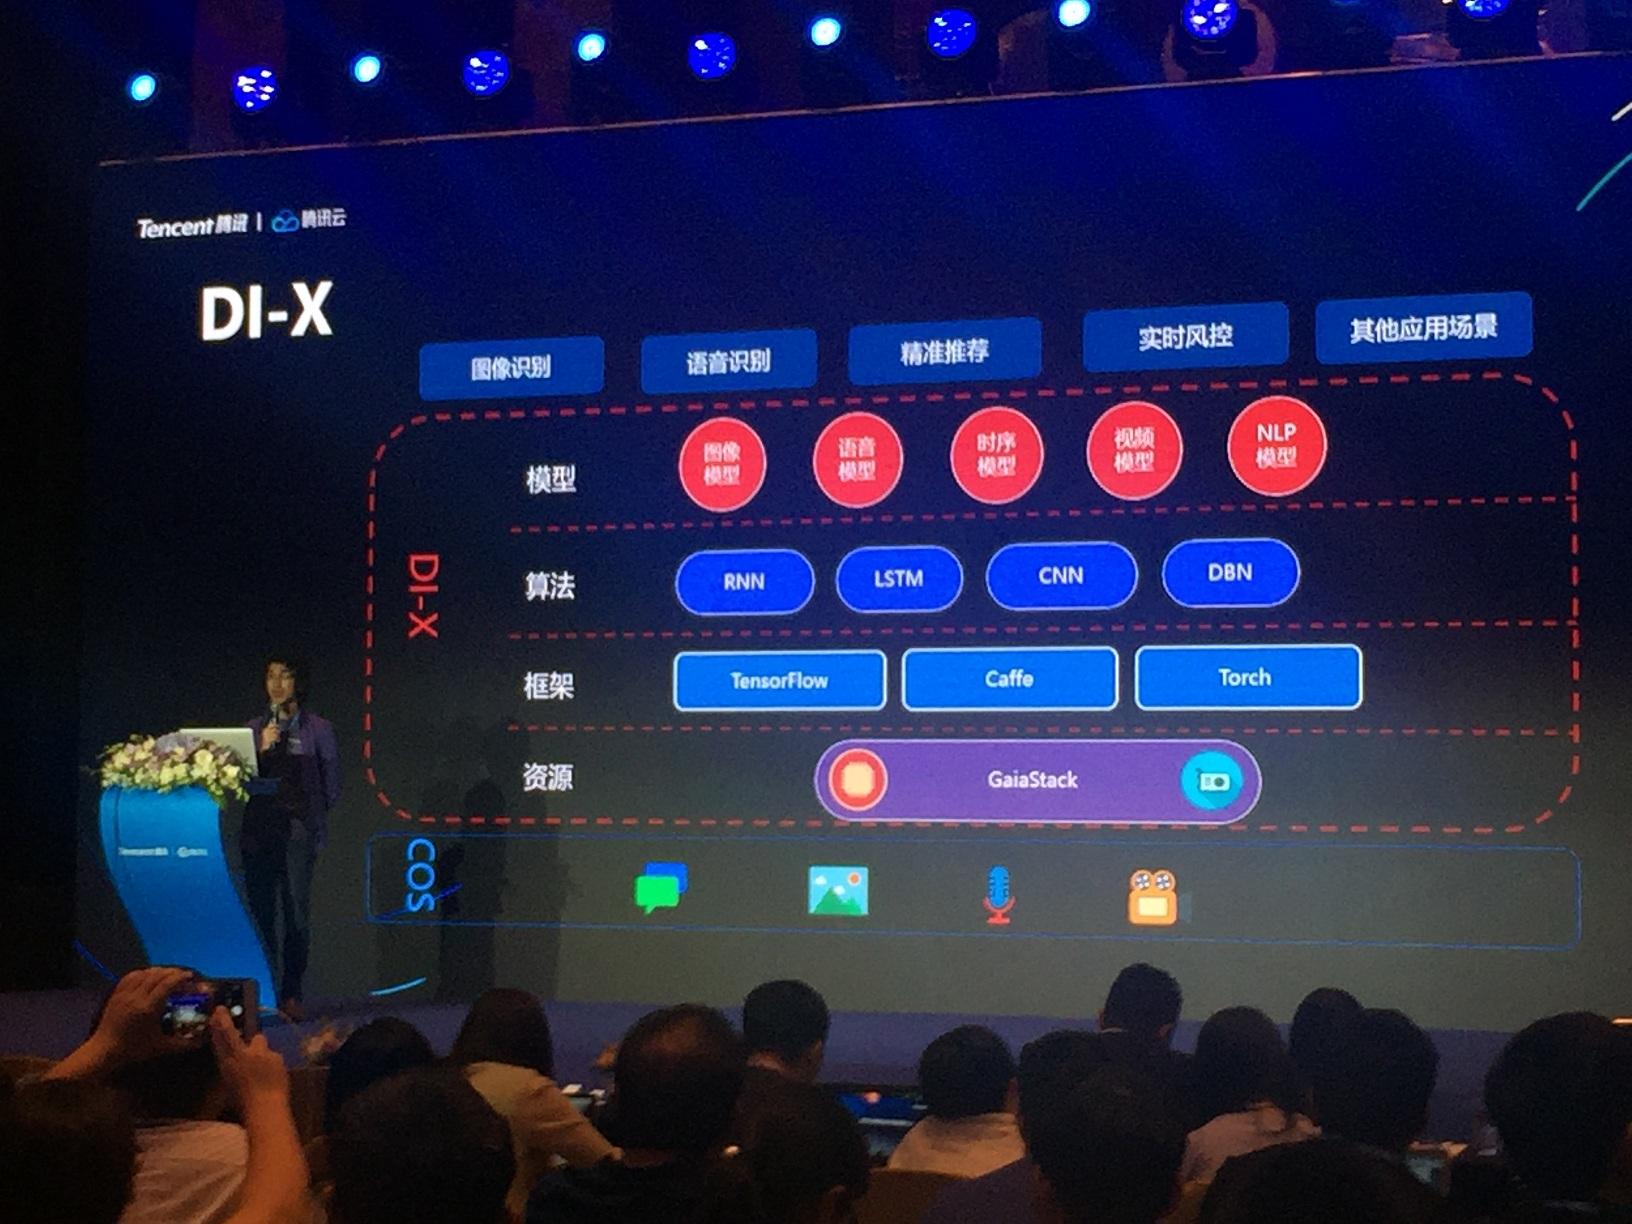 DI-X平台发布:云上的深度学习,助力接入AI快车道